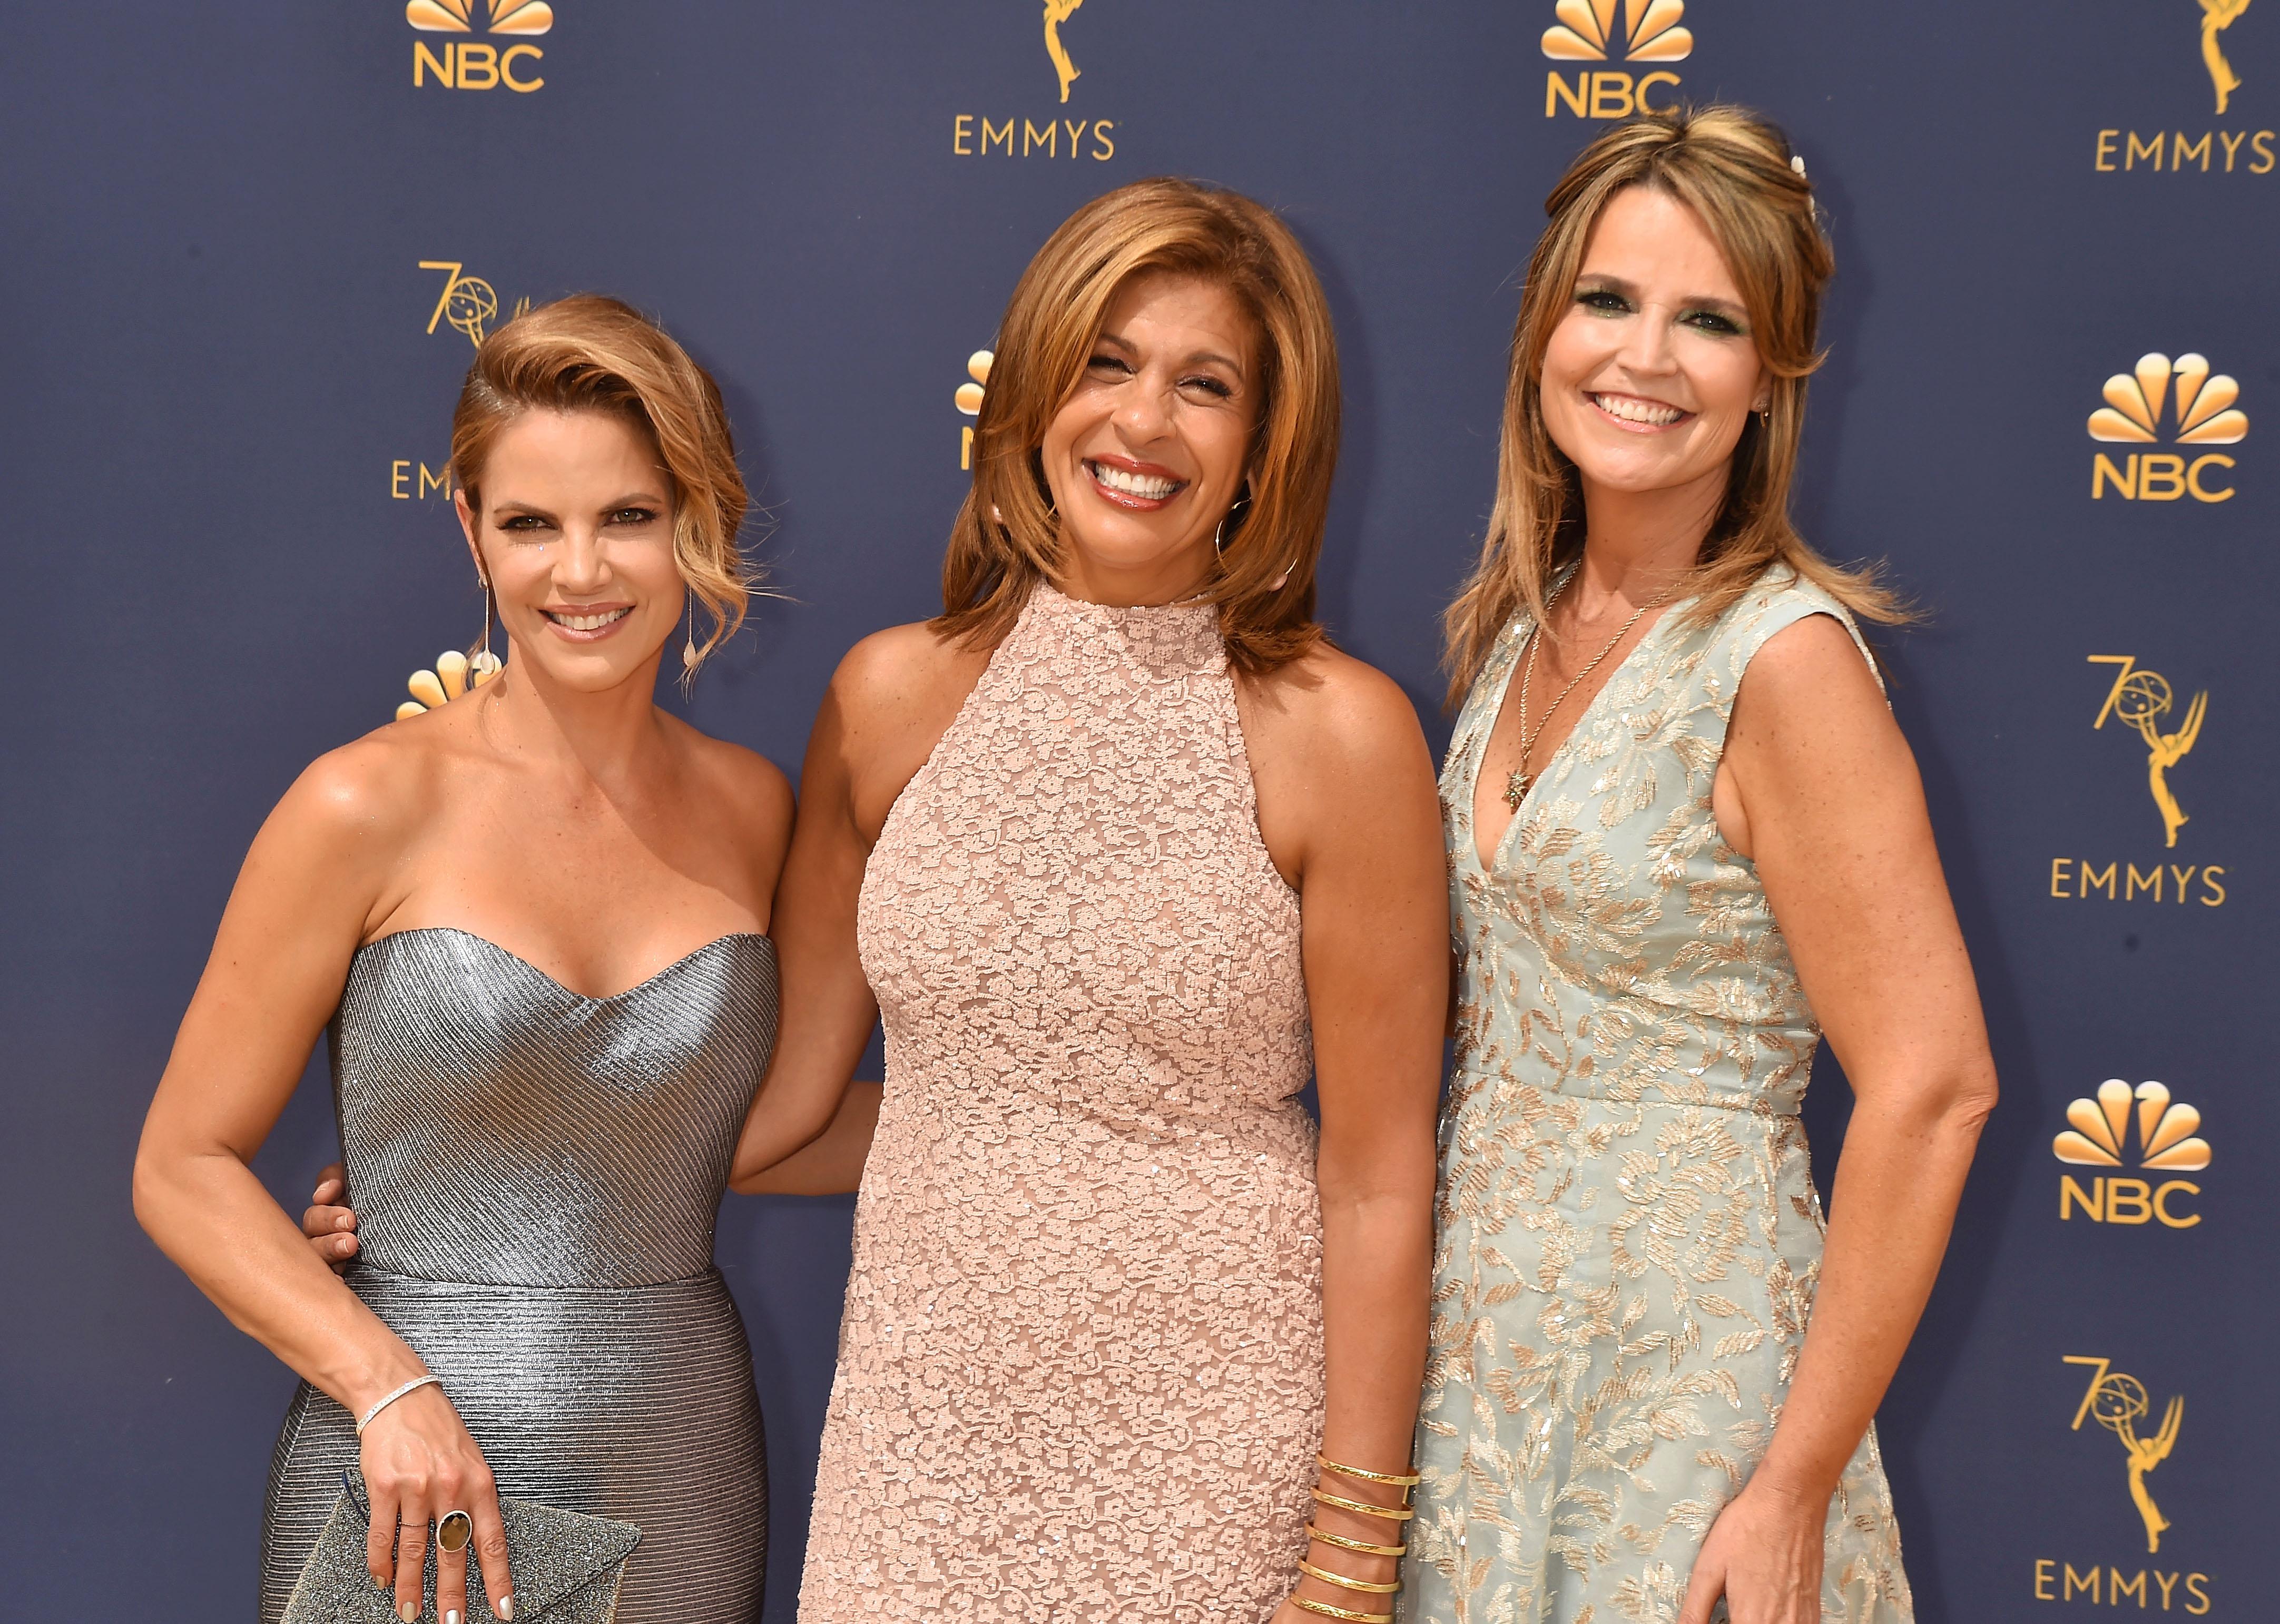 Natalie Morales, Hoda Kotb, Savannah Guthrie at the 70th Emmy Awards in Los Angeles